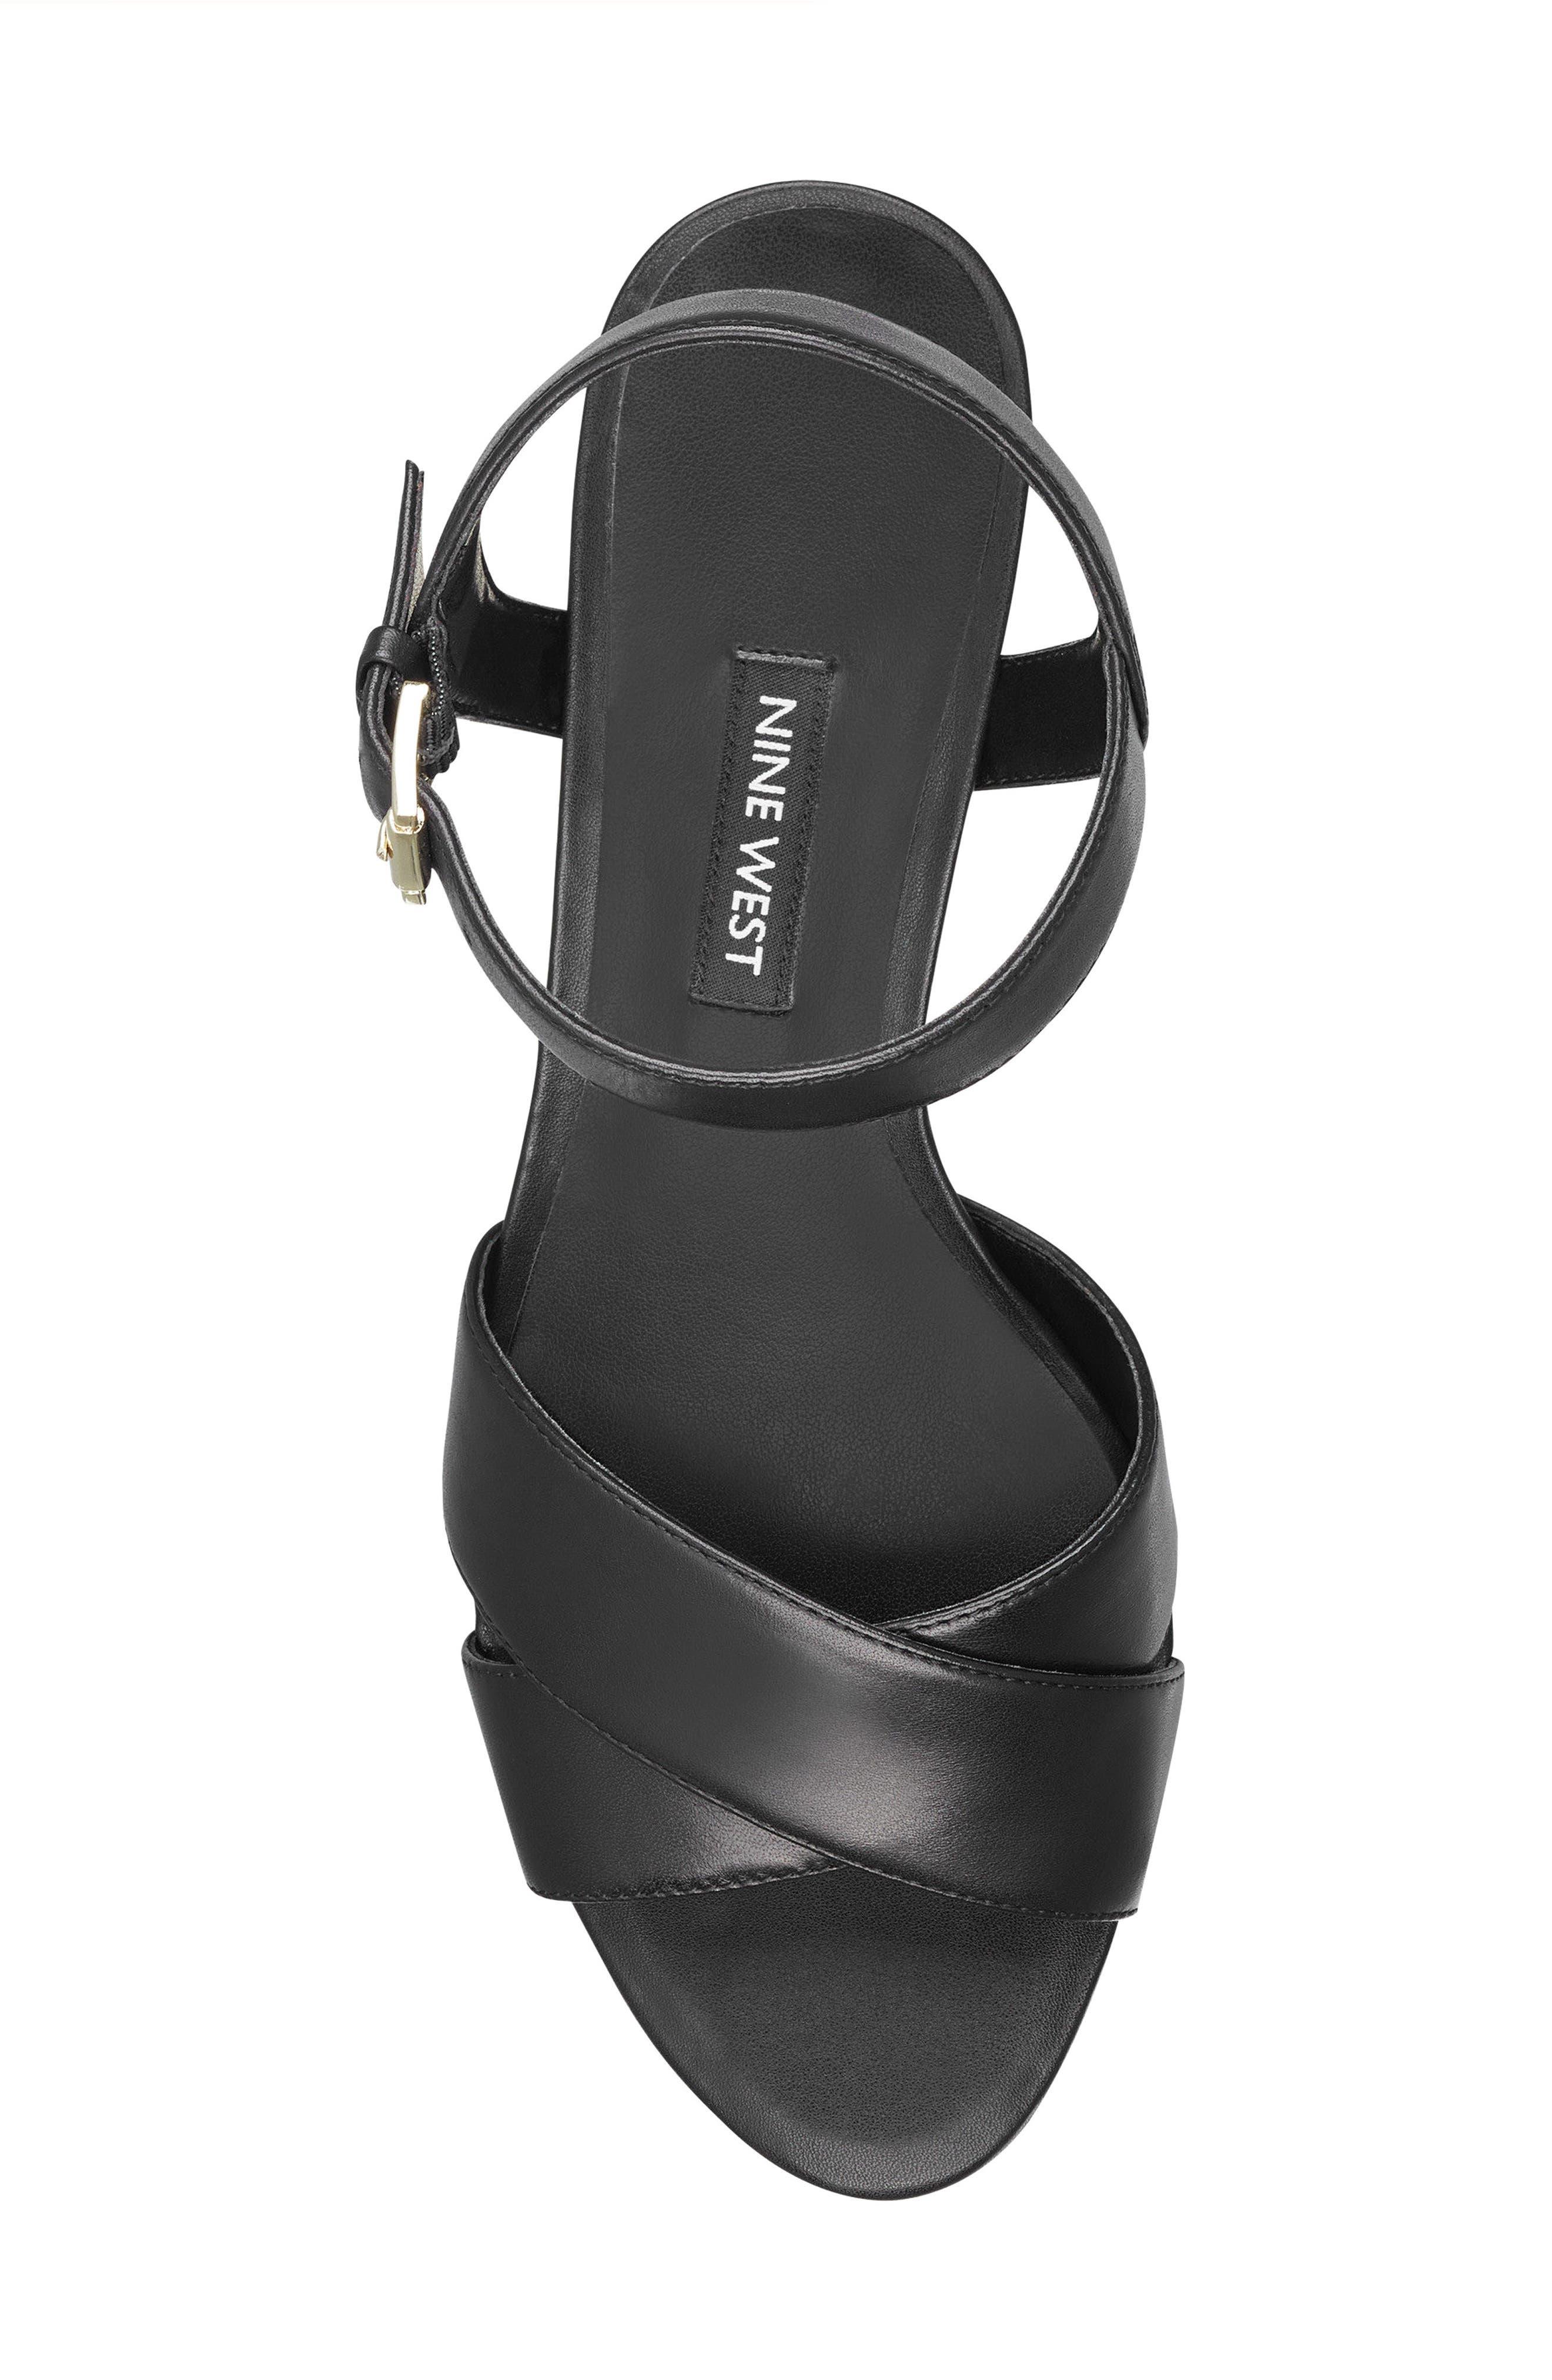 Laglade Wedge Sandal,                             Alternate thumbnail 5, color,                             BLACK FAUX LEATHER